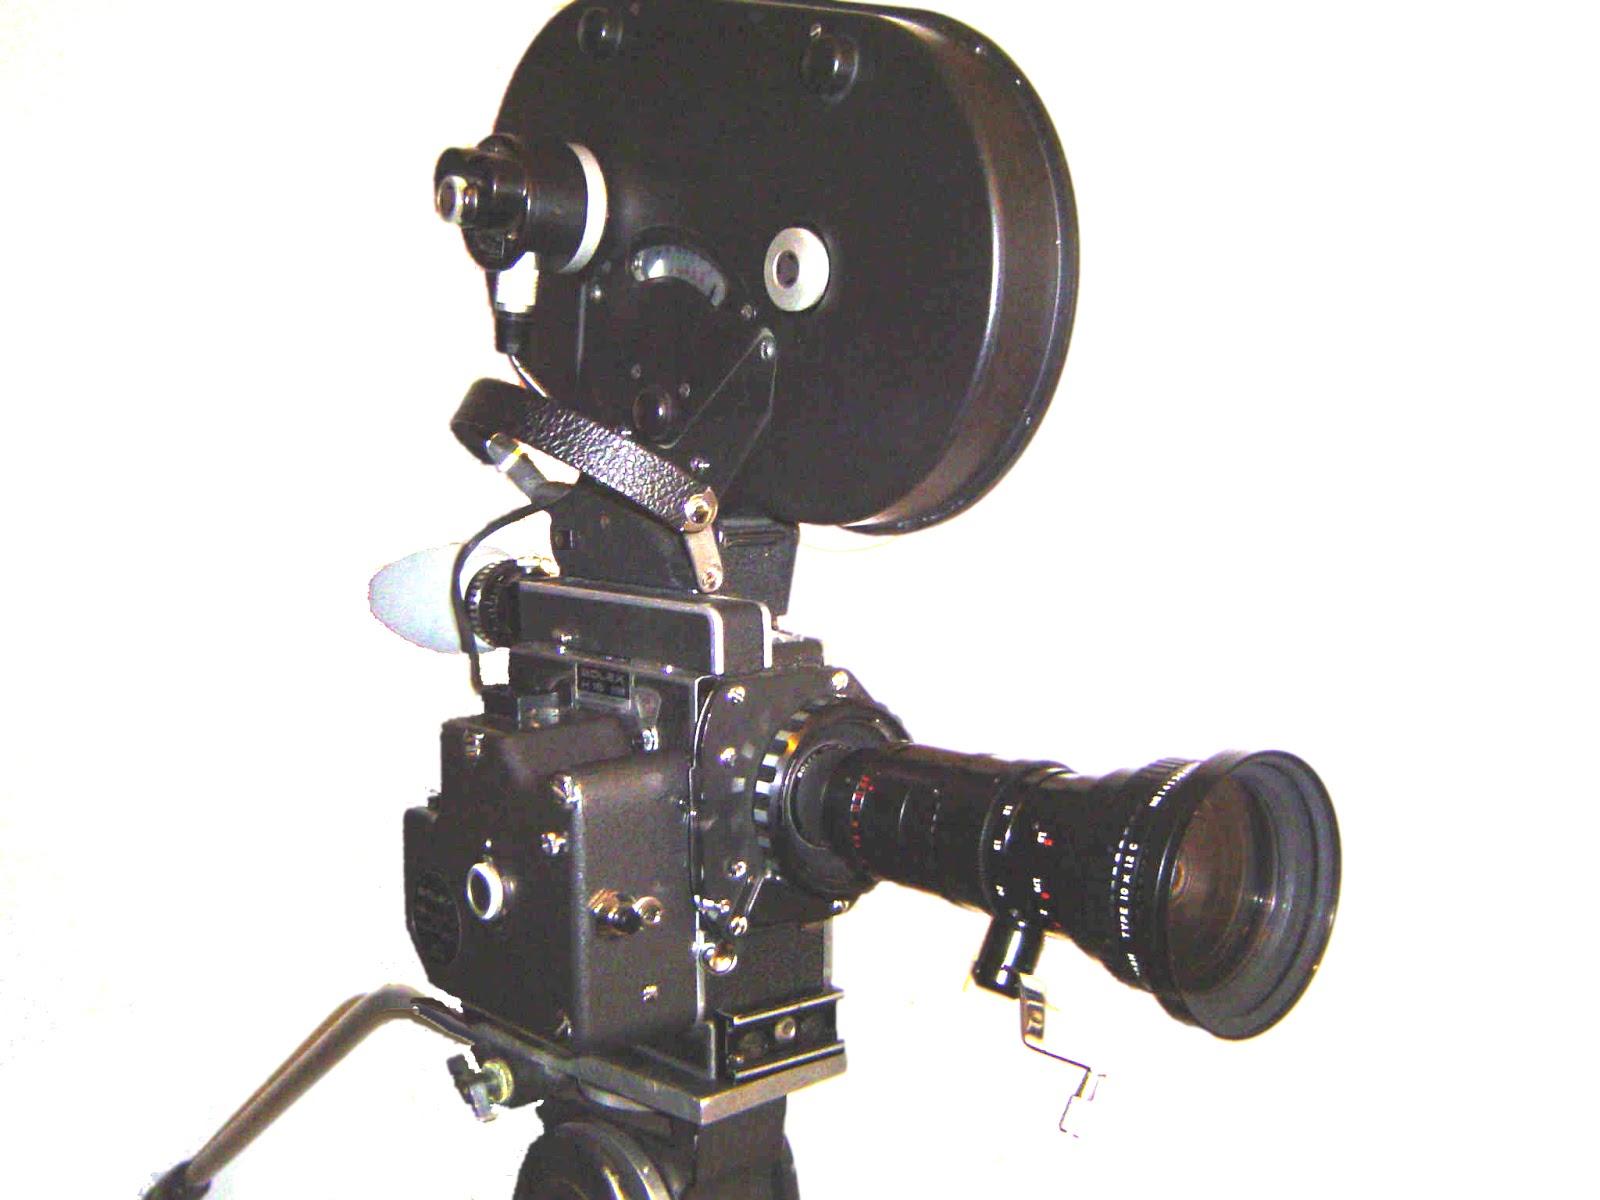 Ins Kino: Tipos De Cámaras De Cine